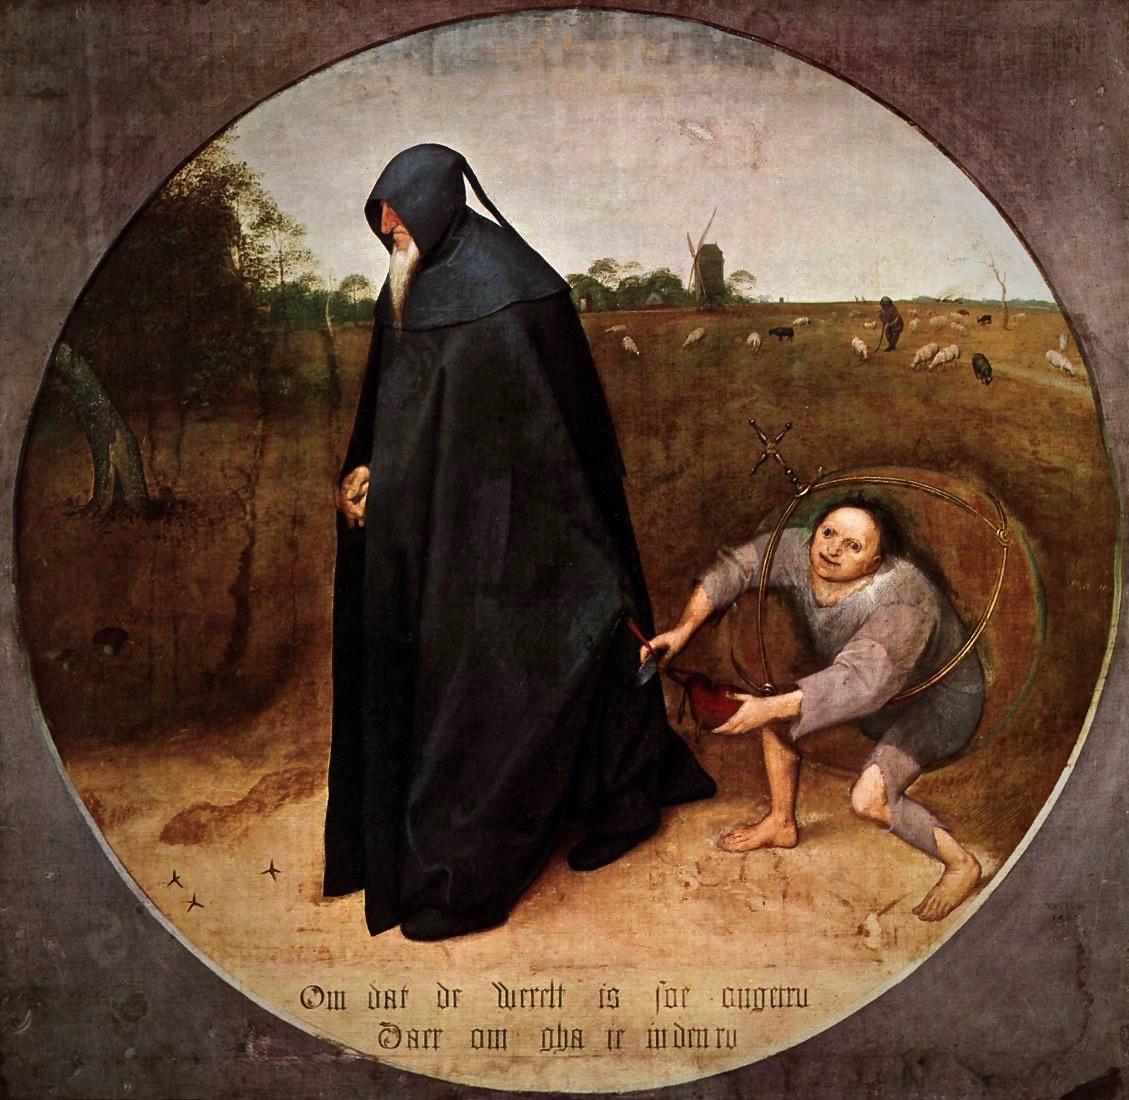 Pieter_Bruegel_the_Elder_-_The_Misanthrope_-_WGA3521